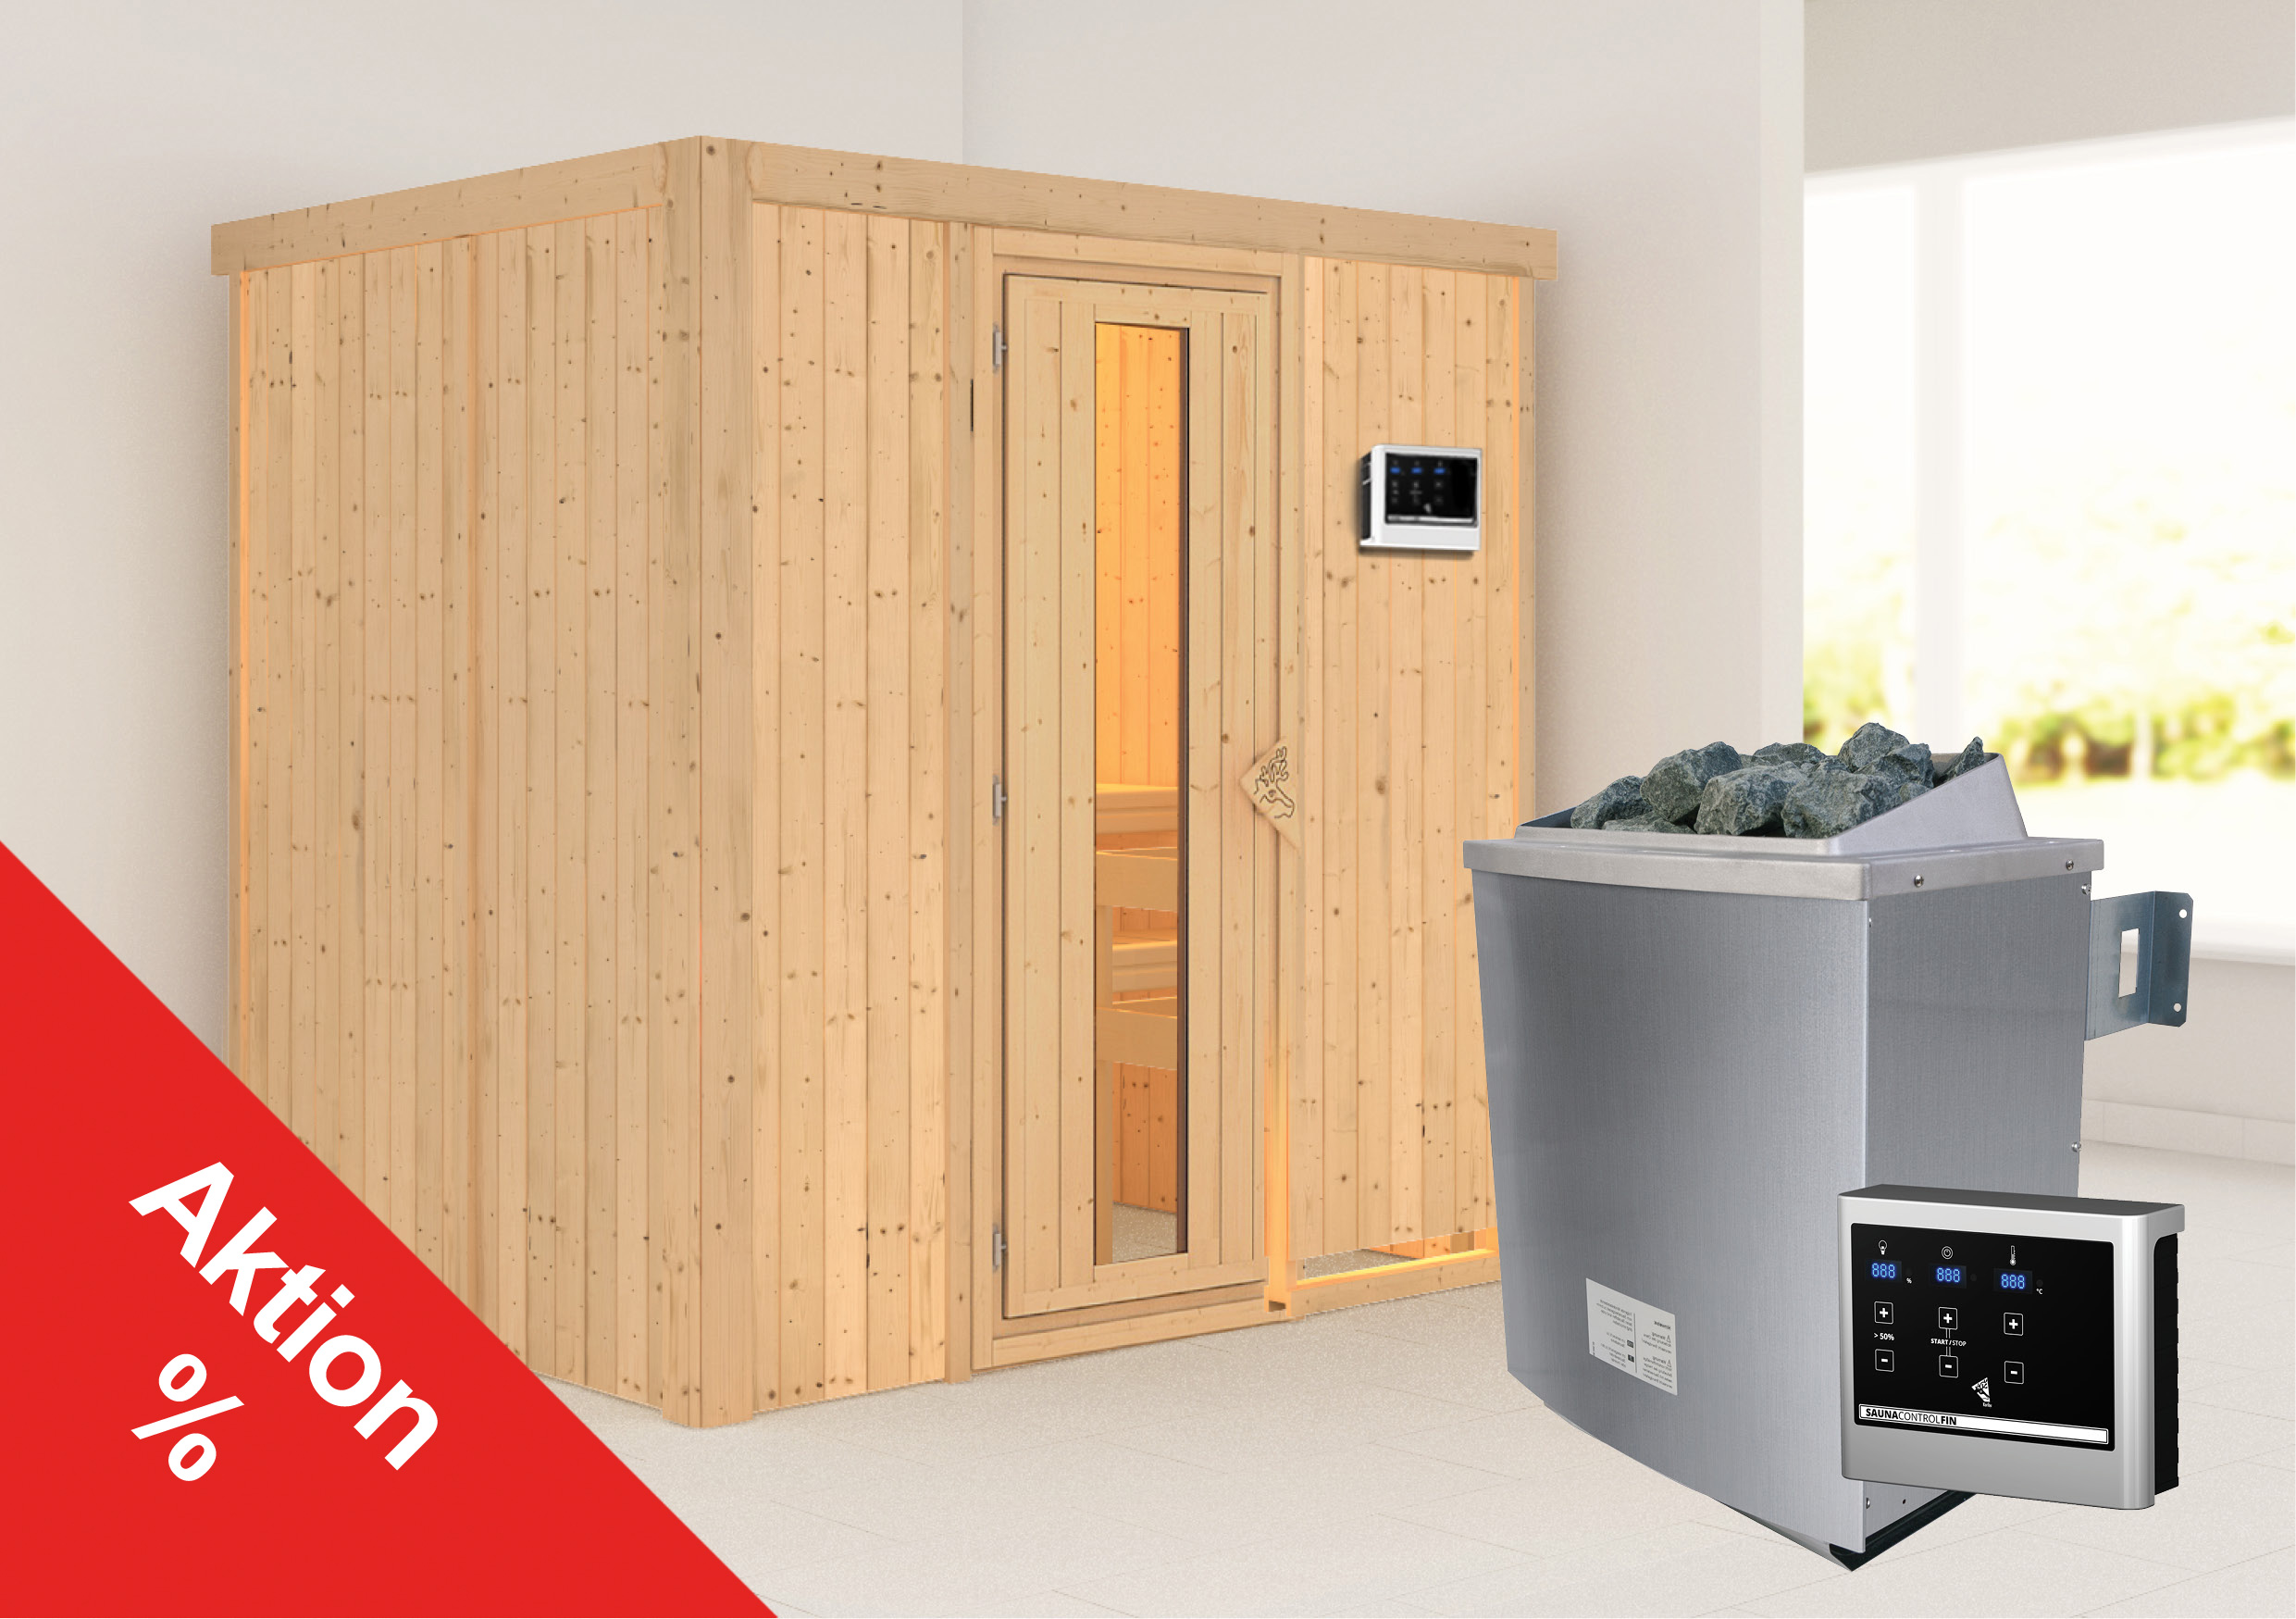 Karibu Sauna Sodina 68mm mit Saunaofen 9kW extern Holztür Aktion Bild 1